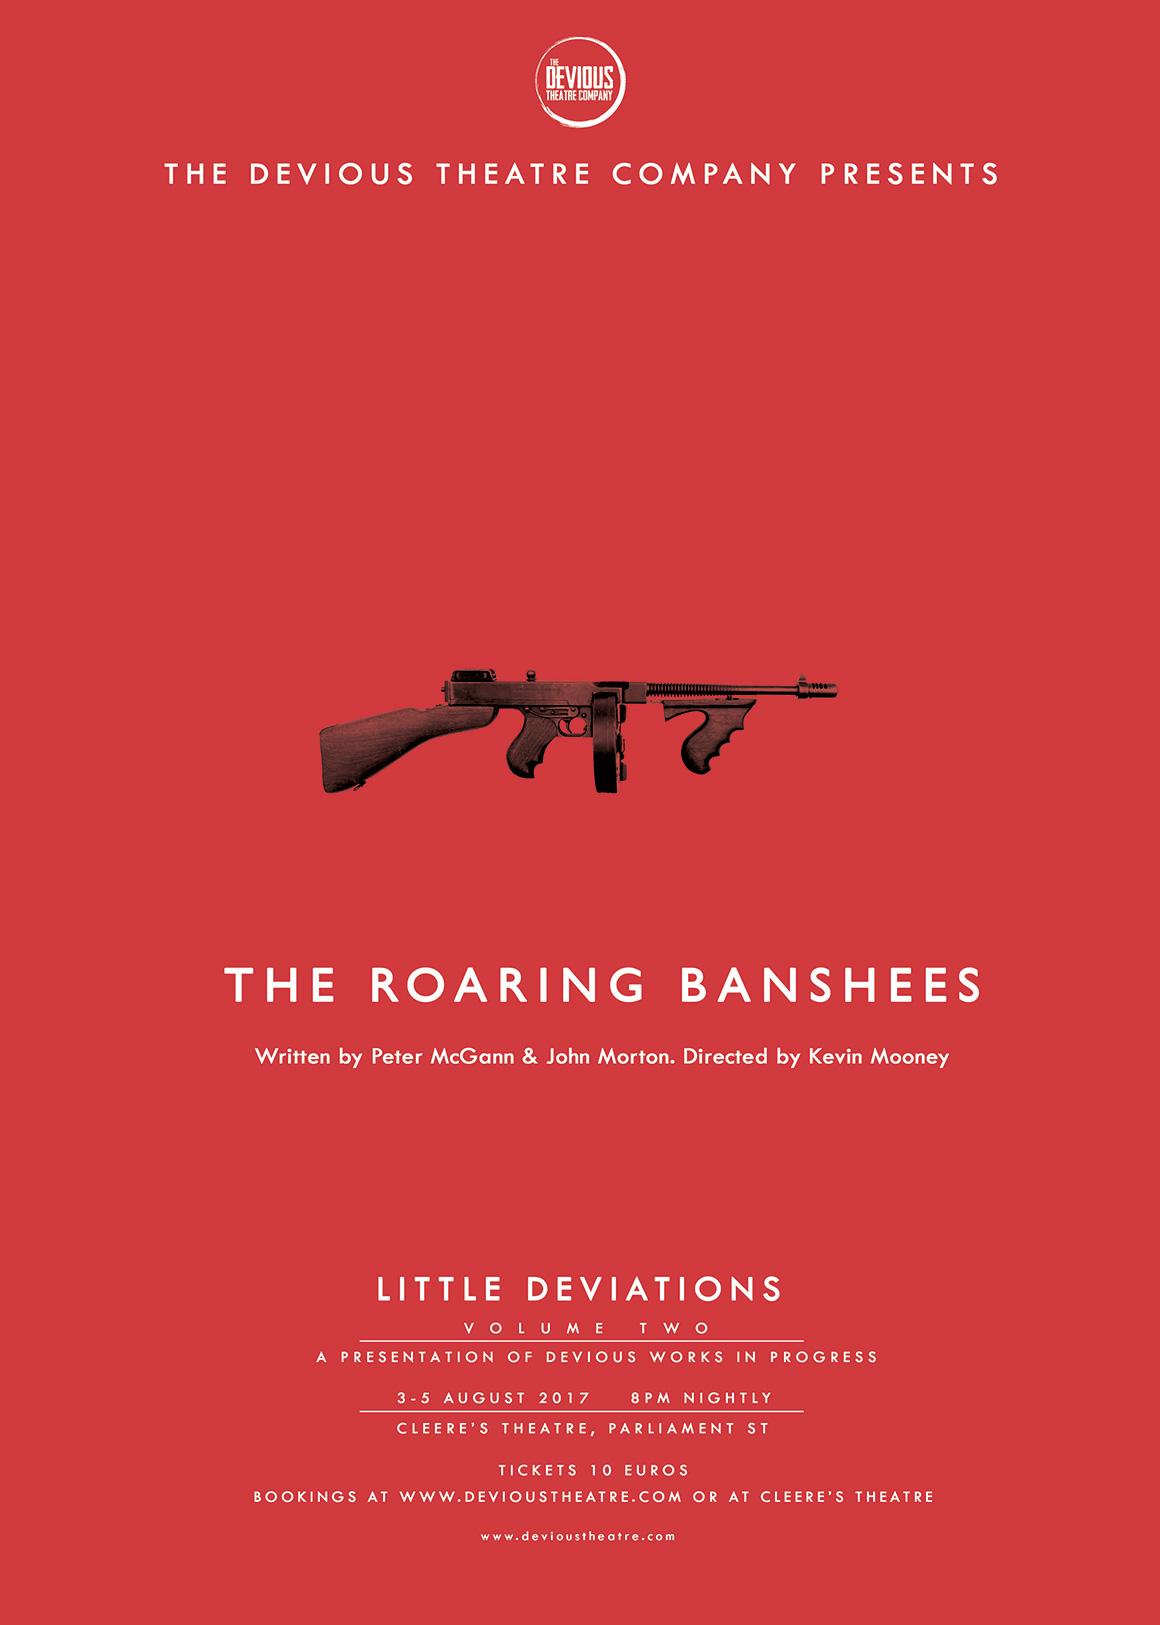 Roaring-banshees_03